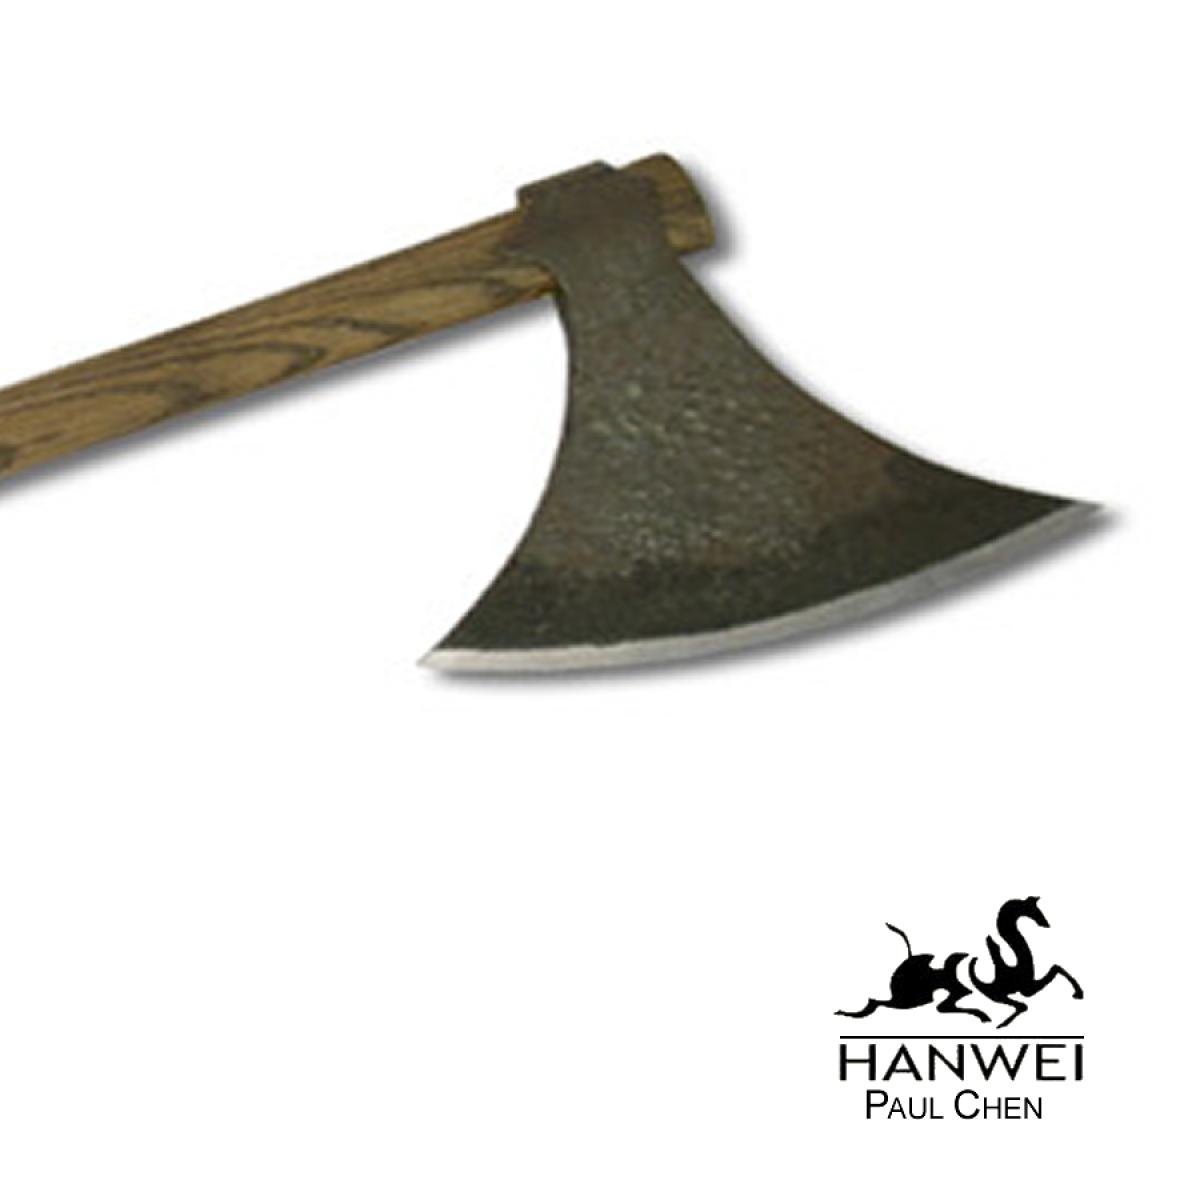 Barringtons Swords   Hanwei Paul Chen Viking Axe (Antiqued)